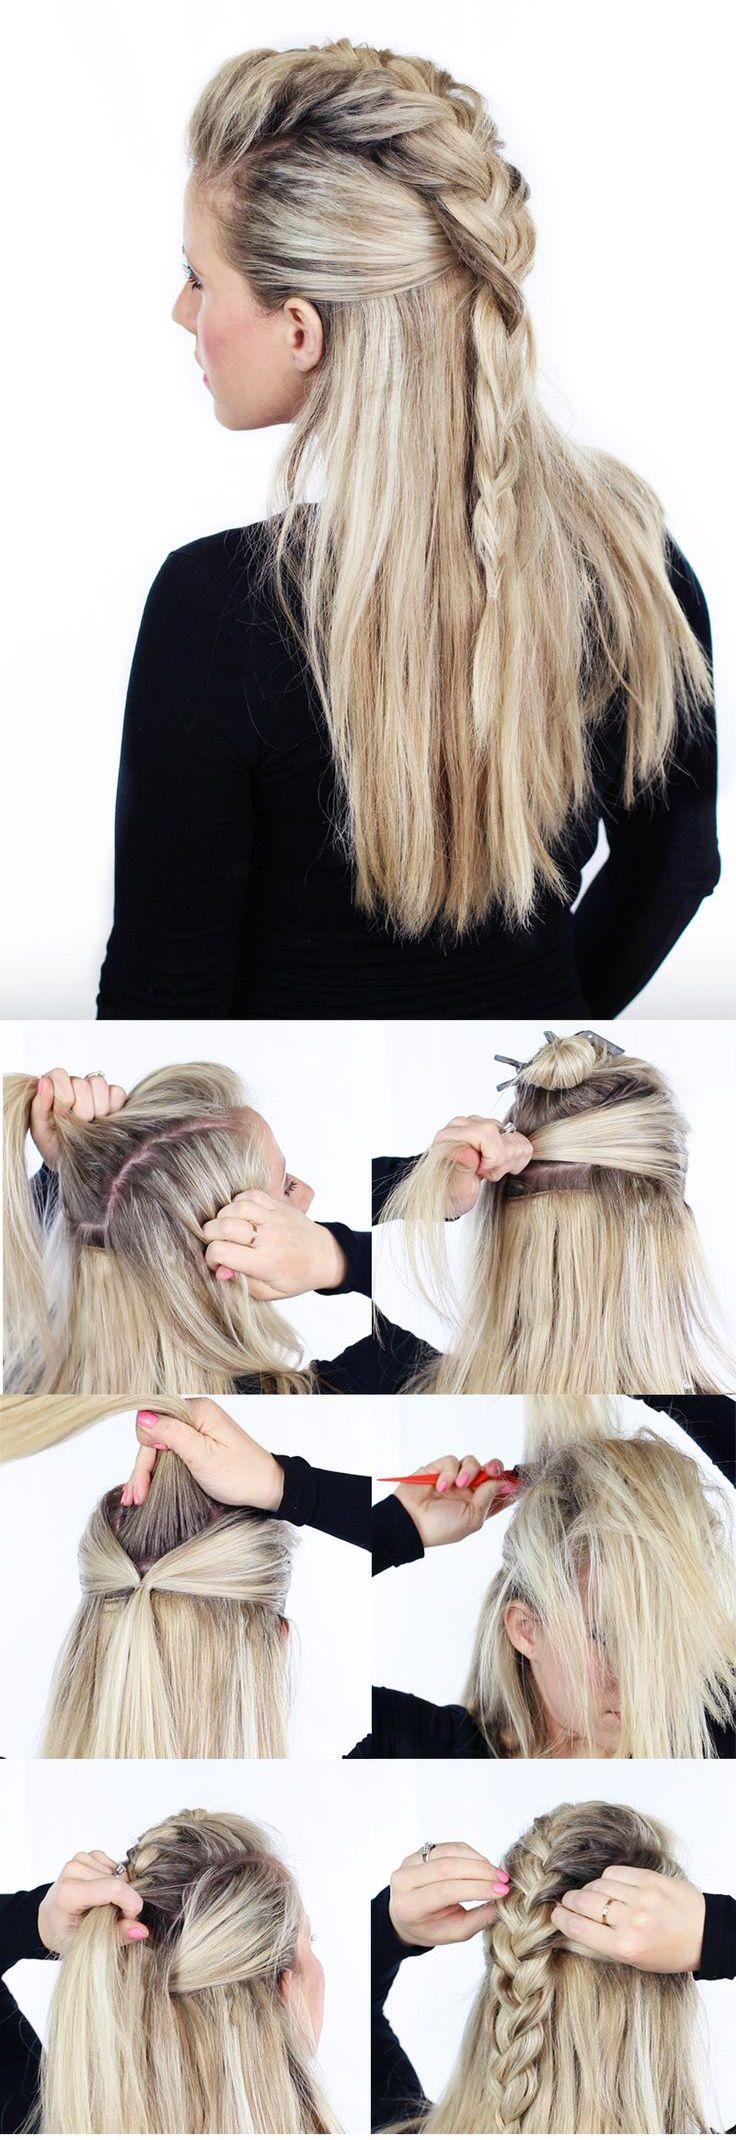 best hair images on pinterest hair ideas hair colors and hair